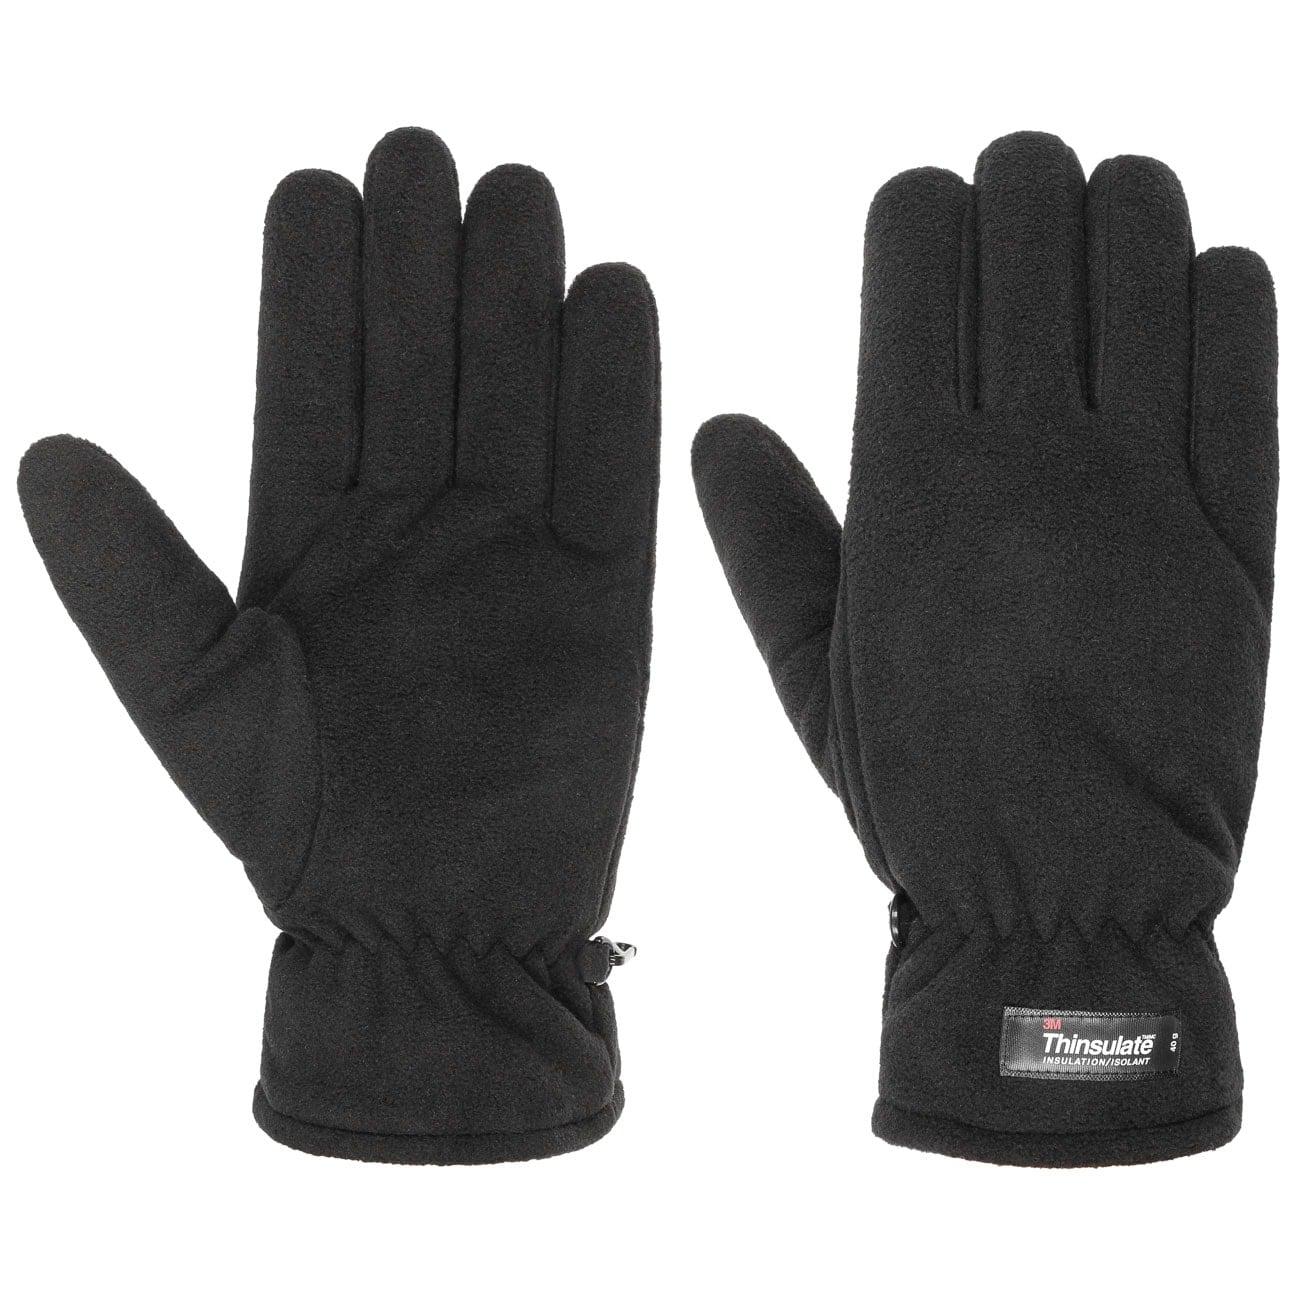 Thinsulate Fleece Handschuhe by Lipodo